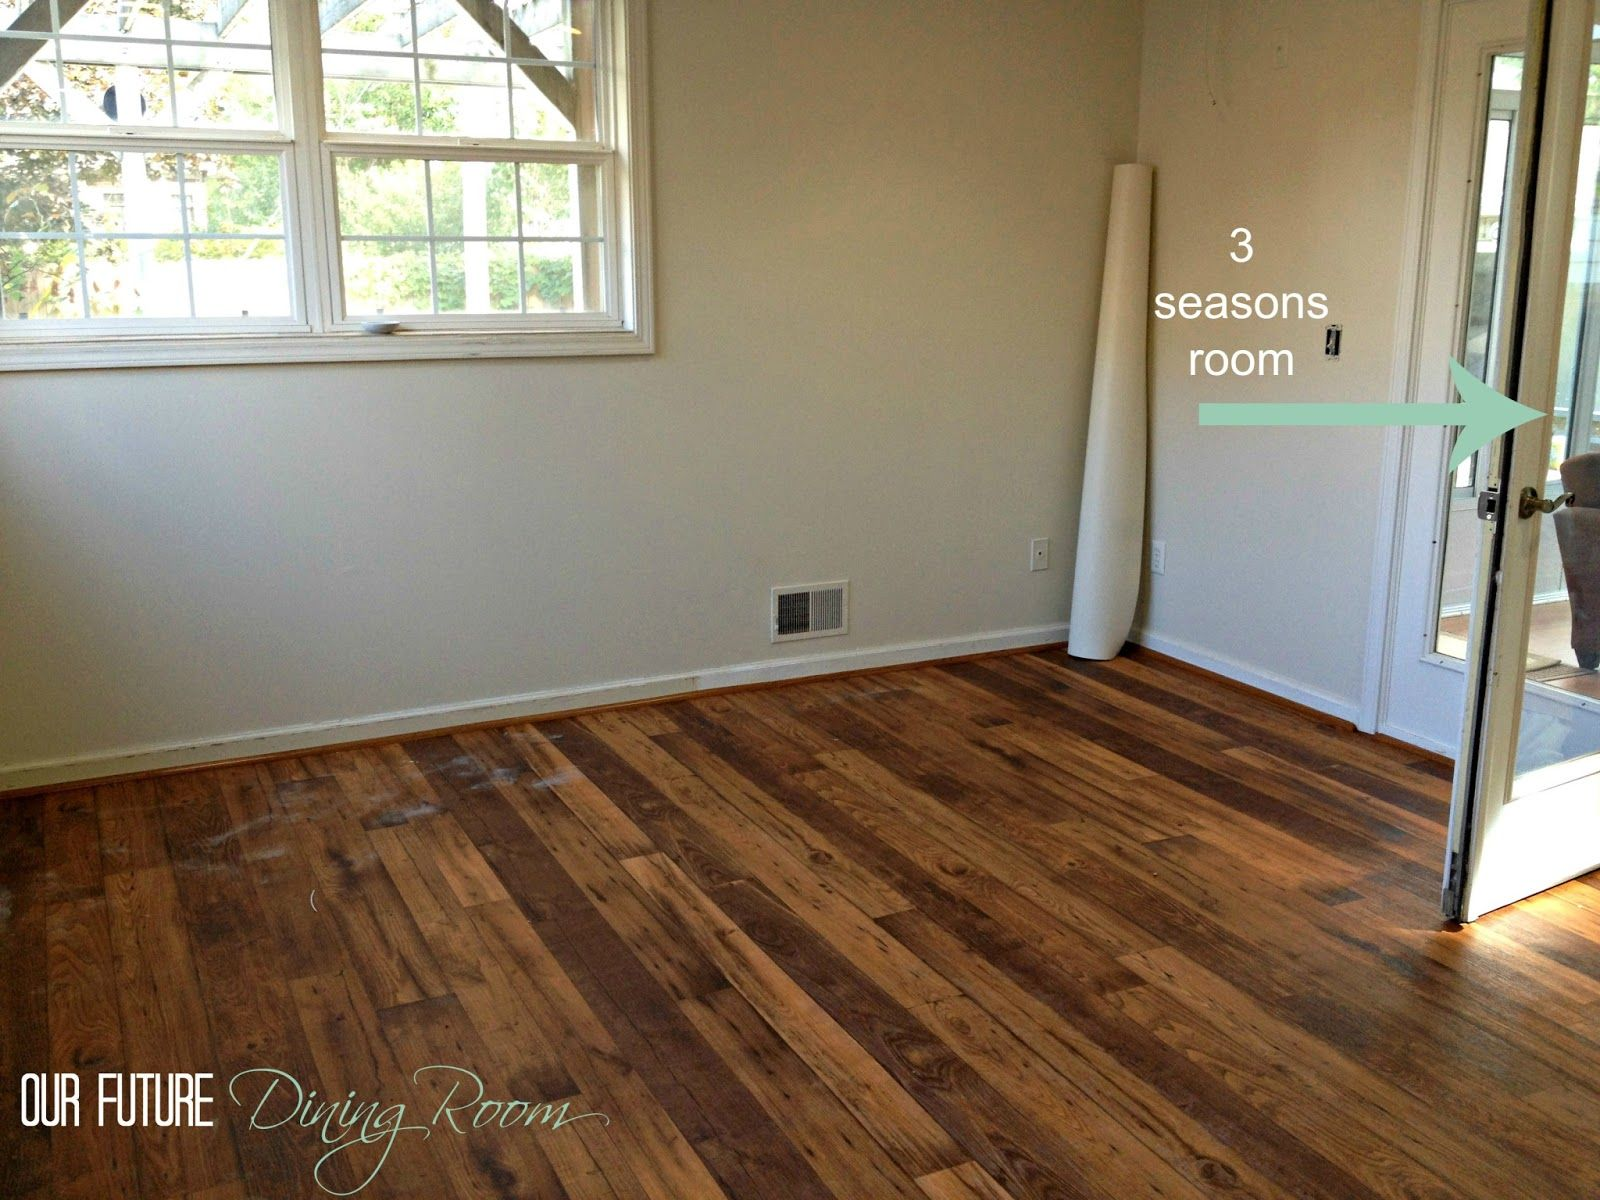 kitchen flooring wood floor in kitchen linoleum wood flooring faux hardwood we went with a textured vinyl flooring